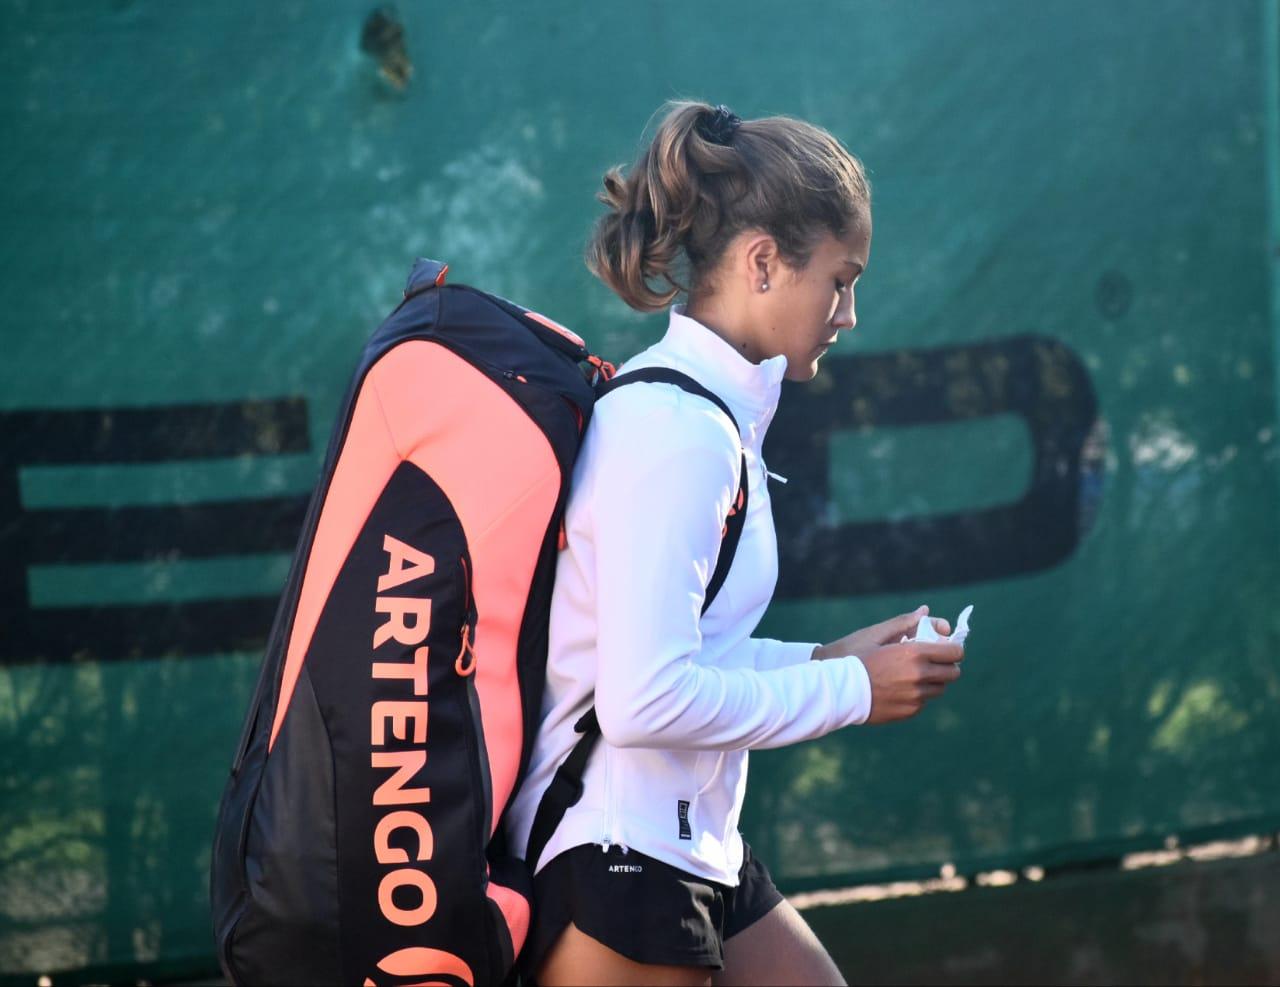 La moldense Luisina Giovannini buscará comenzar su prometedora carrera profesional.